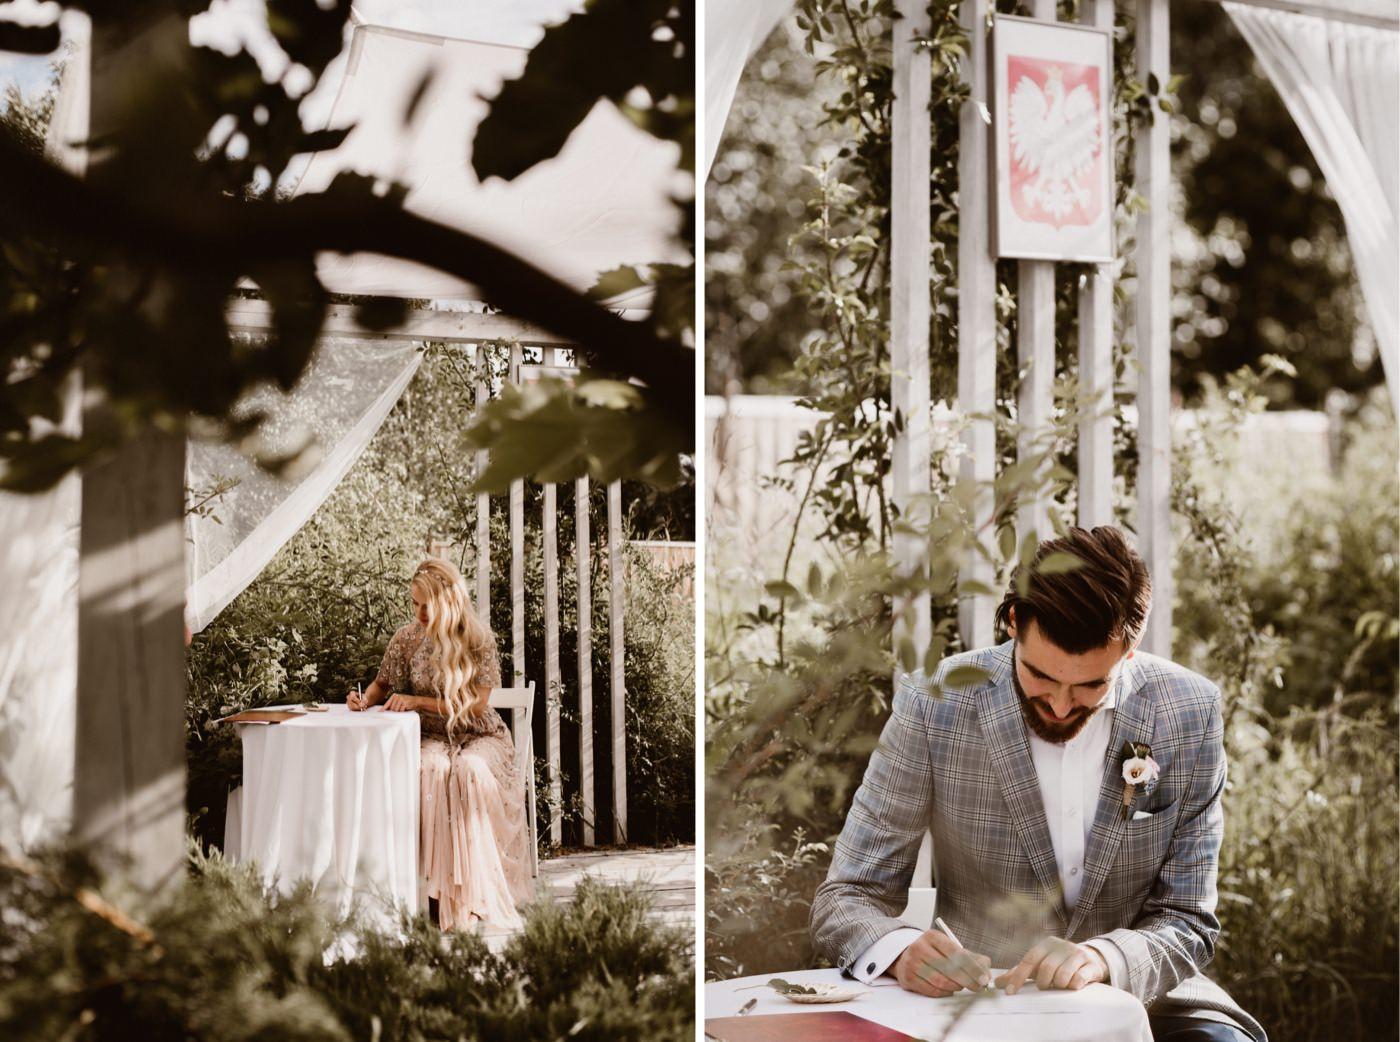 ewelina zieba rustykalne wesele stara oranzeria warszawa 050